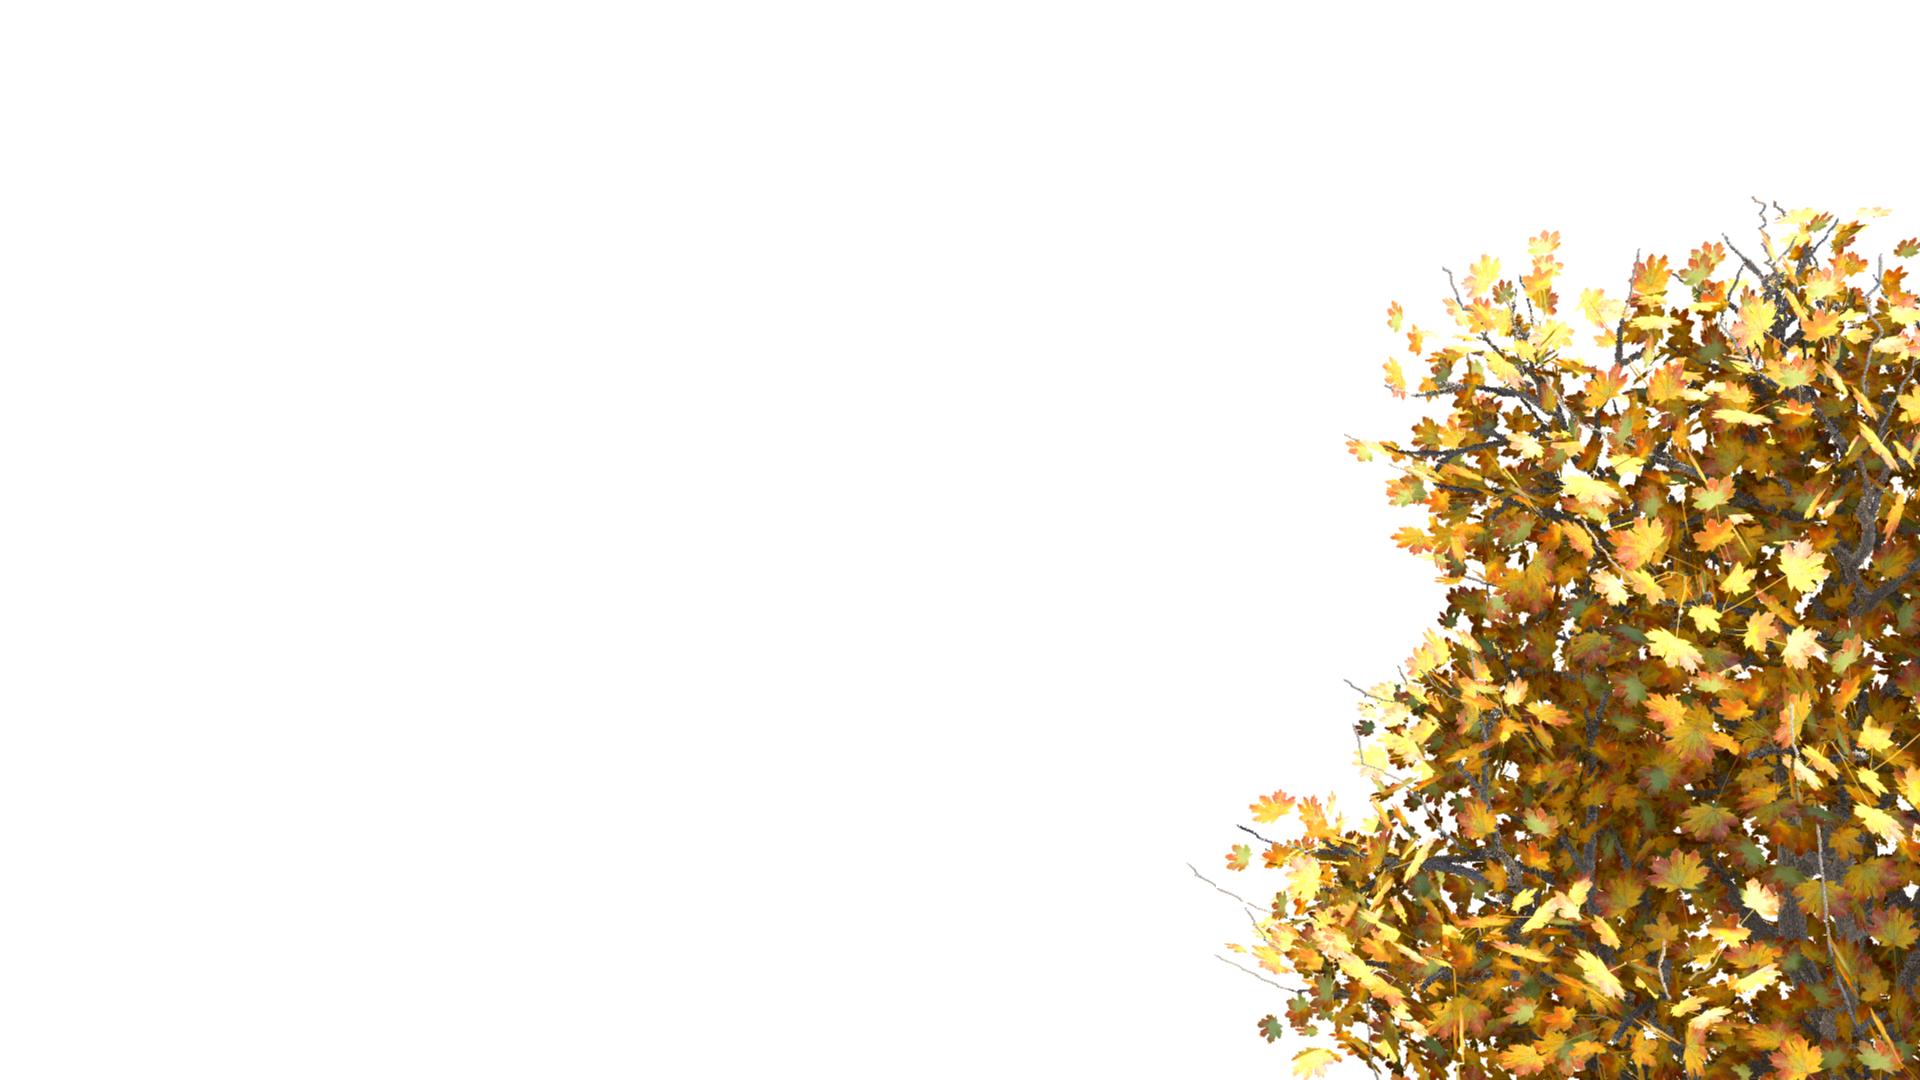 парня кармане фотосток желтое дерево на сером фоне увидел